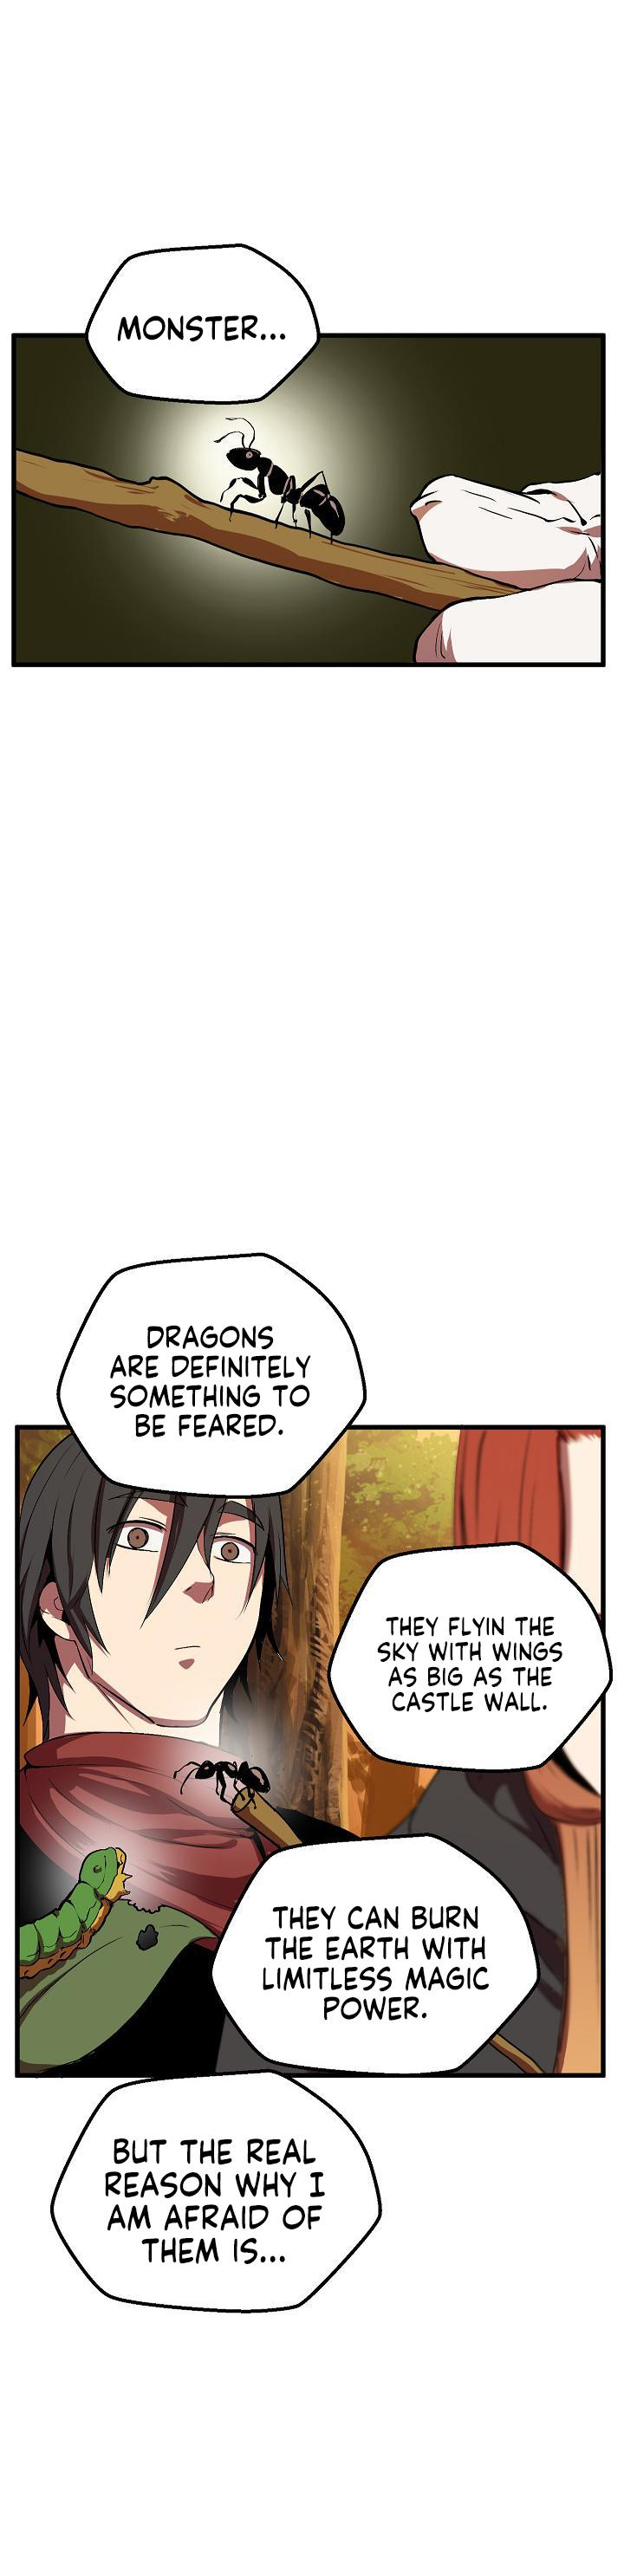 Survival Story Of A Sword King In A Fantasy World Vol.1 Chapter 15 page 30 - Mangakakalots.com